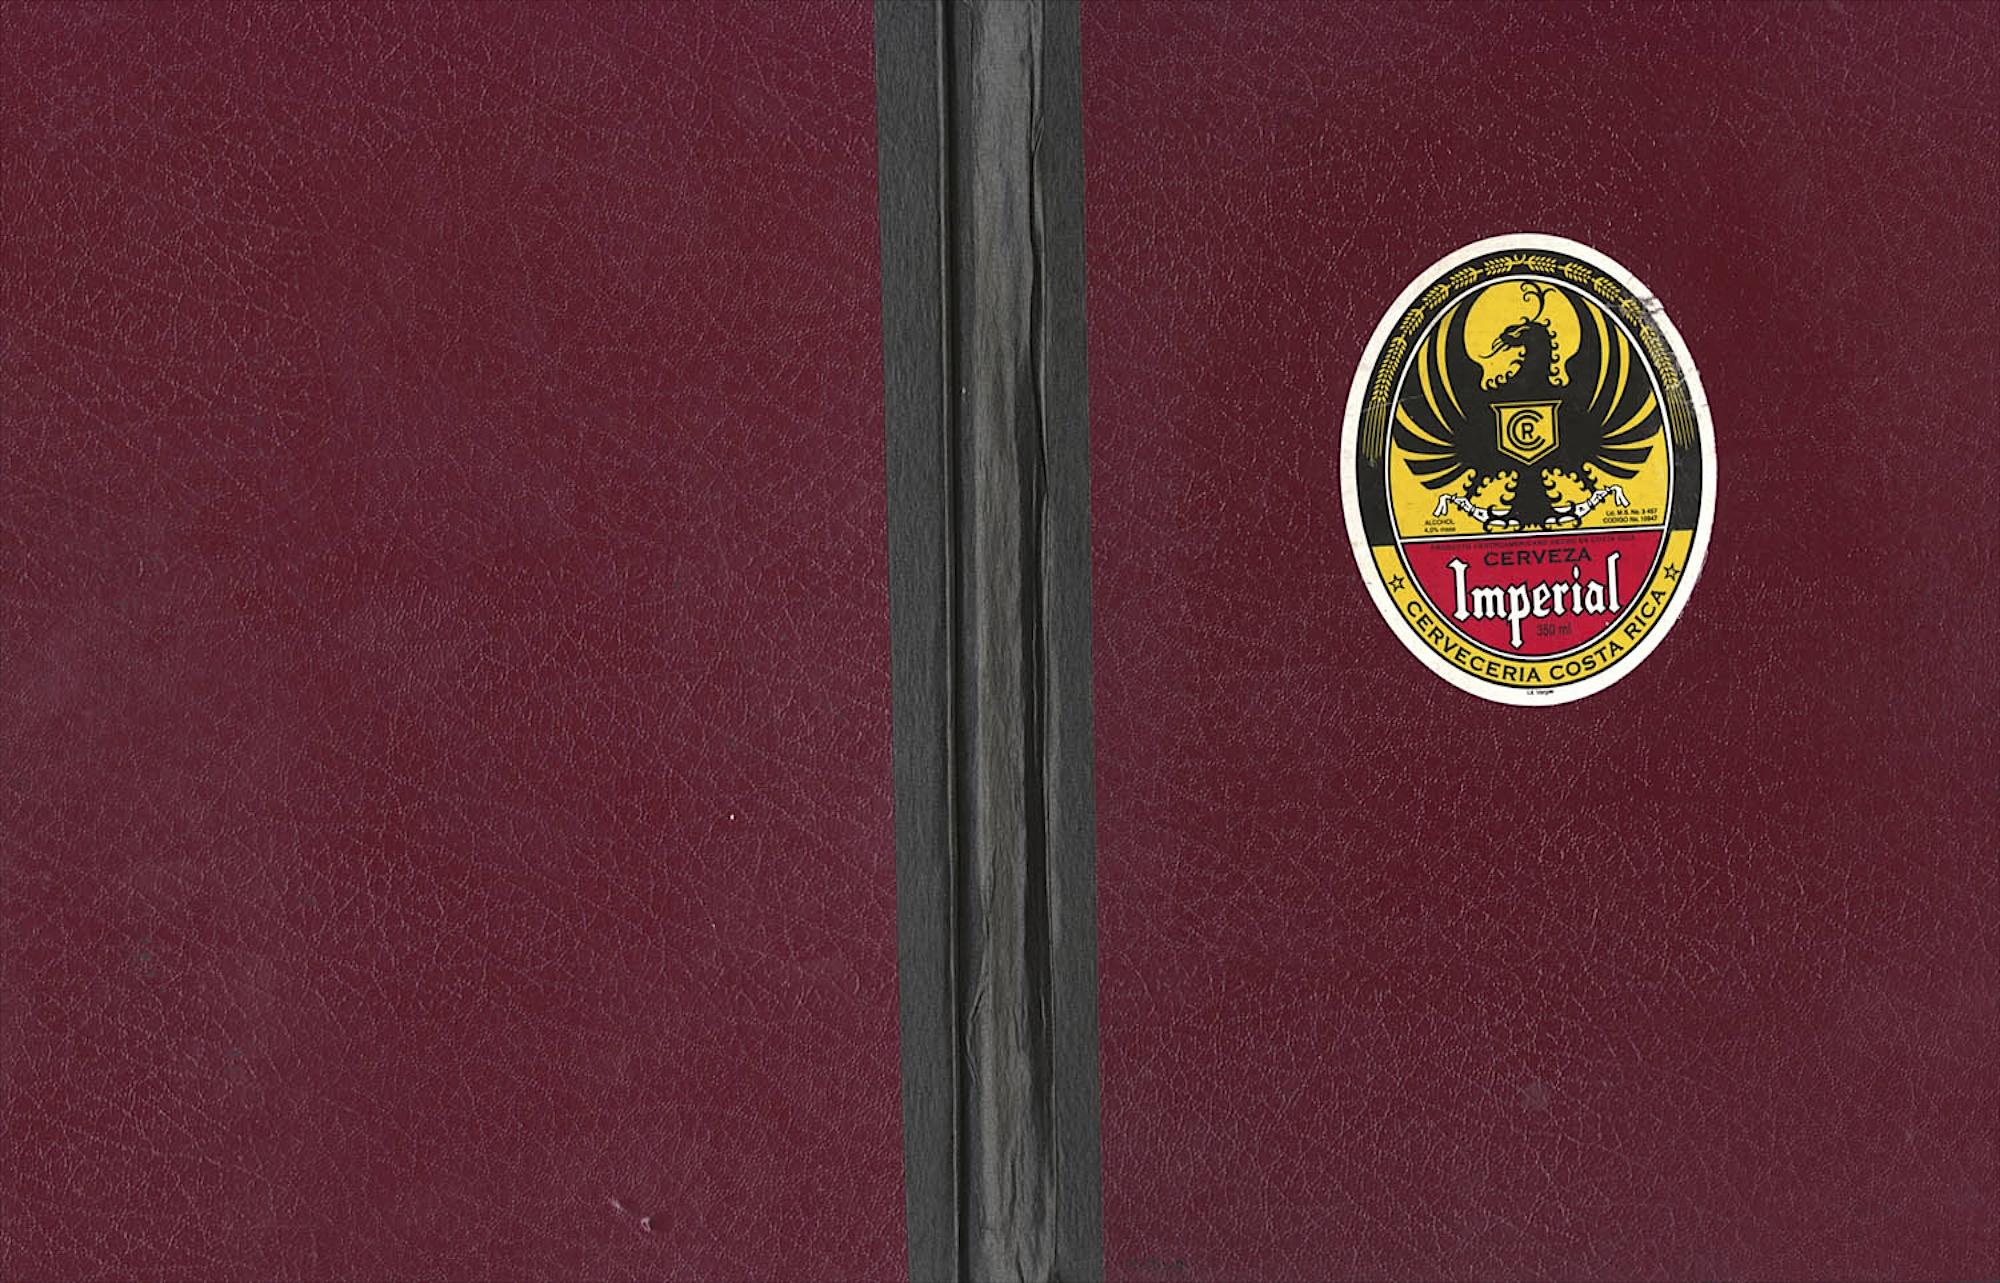 imerial sketchbook cover